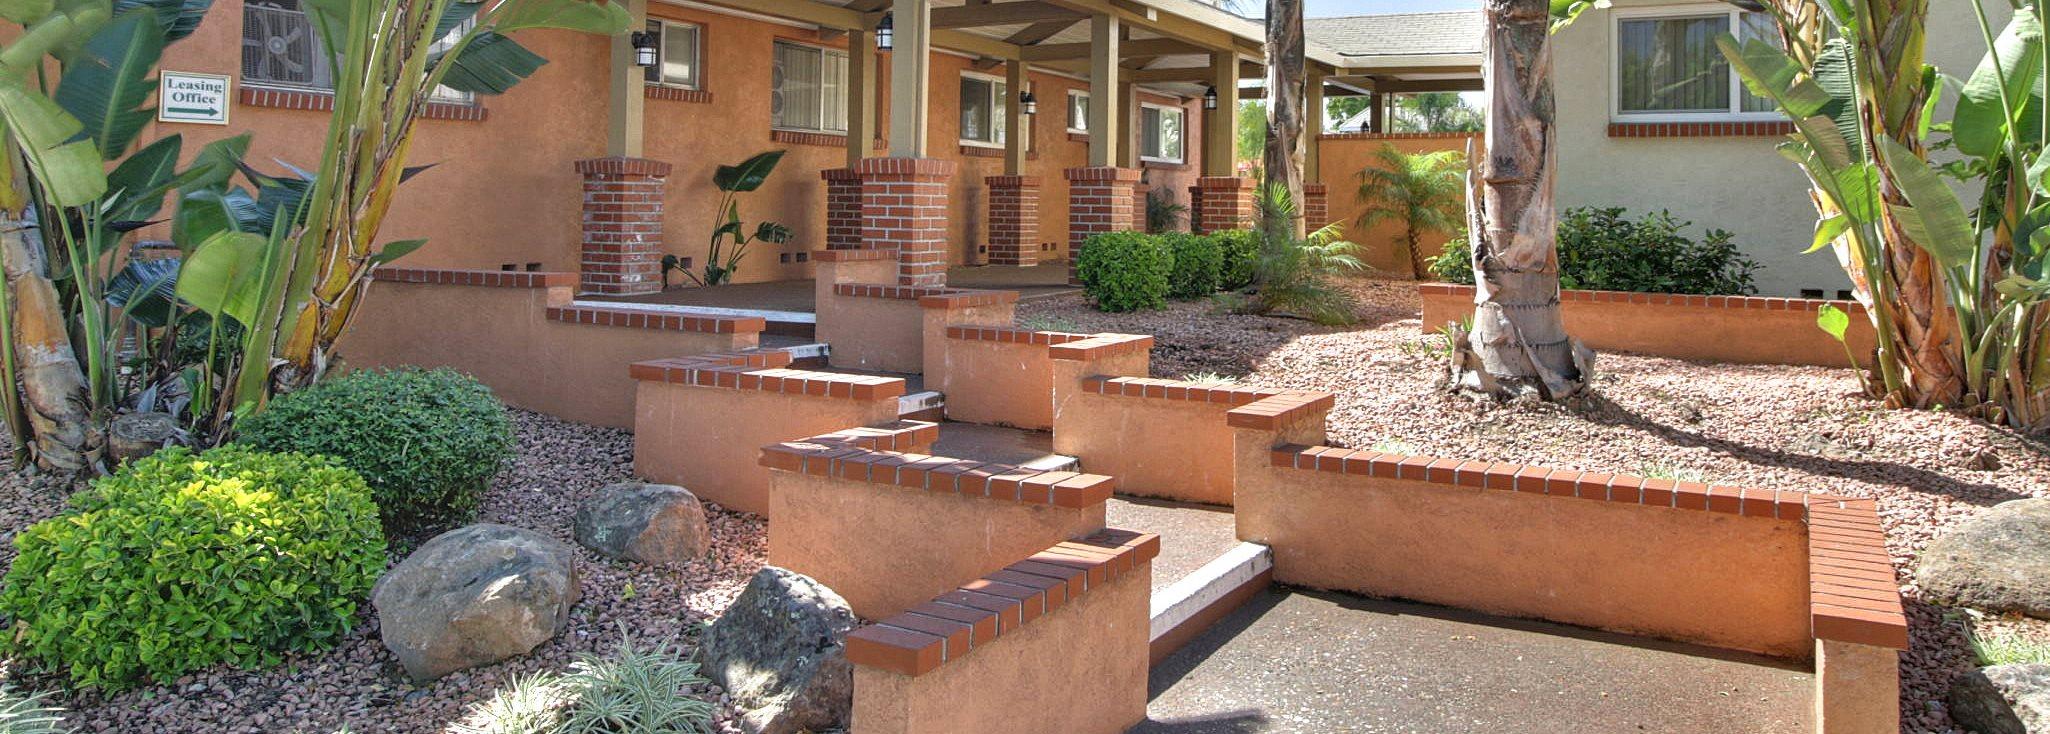 Ranchero Plaza Apartments In San Jose Ca